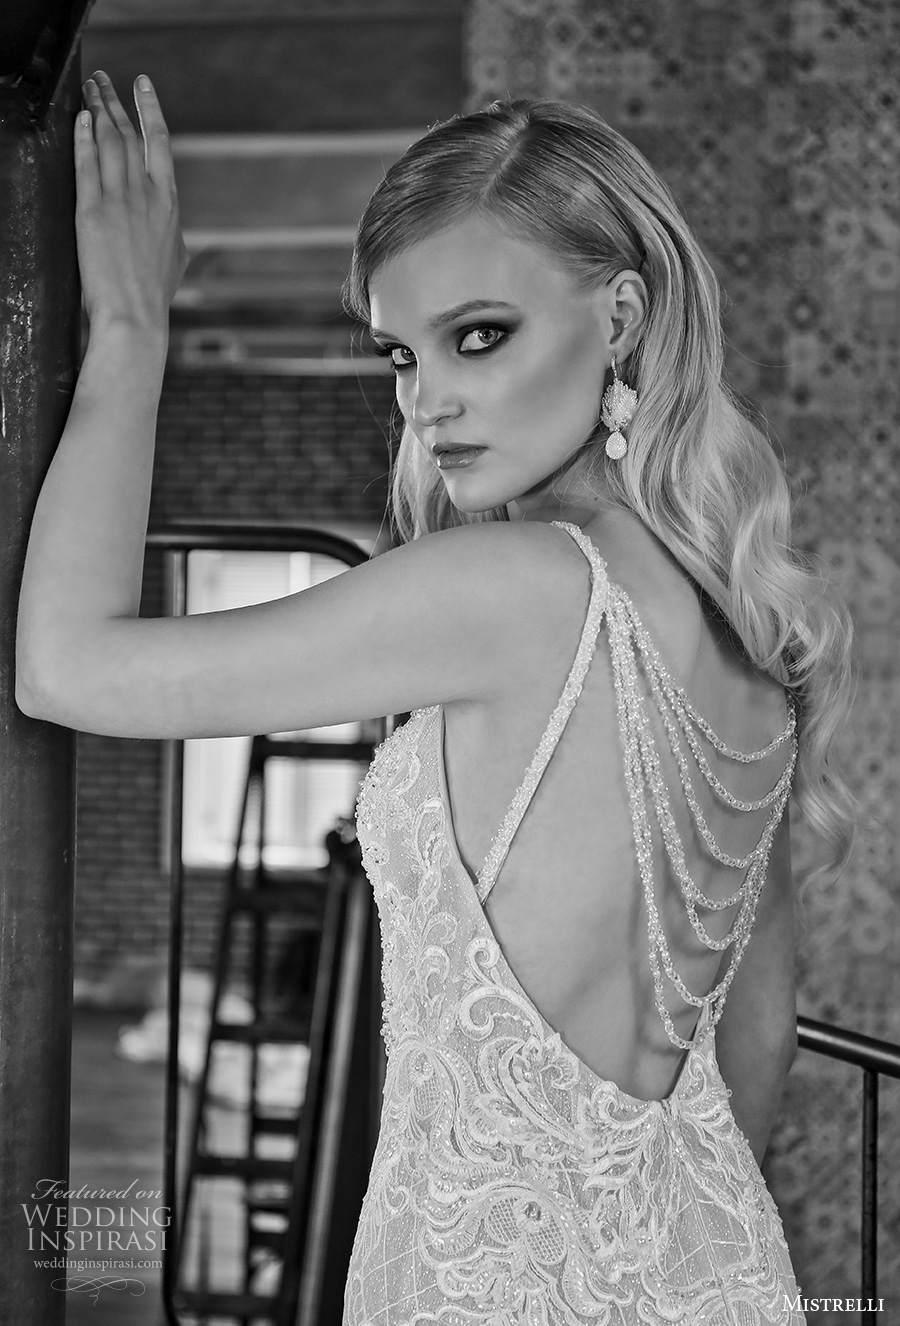 mistrelli 2021 royal drama bridal sleeveless thin strap diamond neckline full embellishment elegant fit and flare sheath wedding dress embellished cowl back chapel train (11) zbv